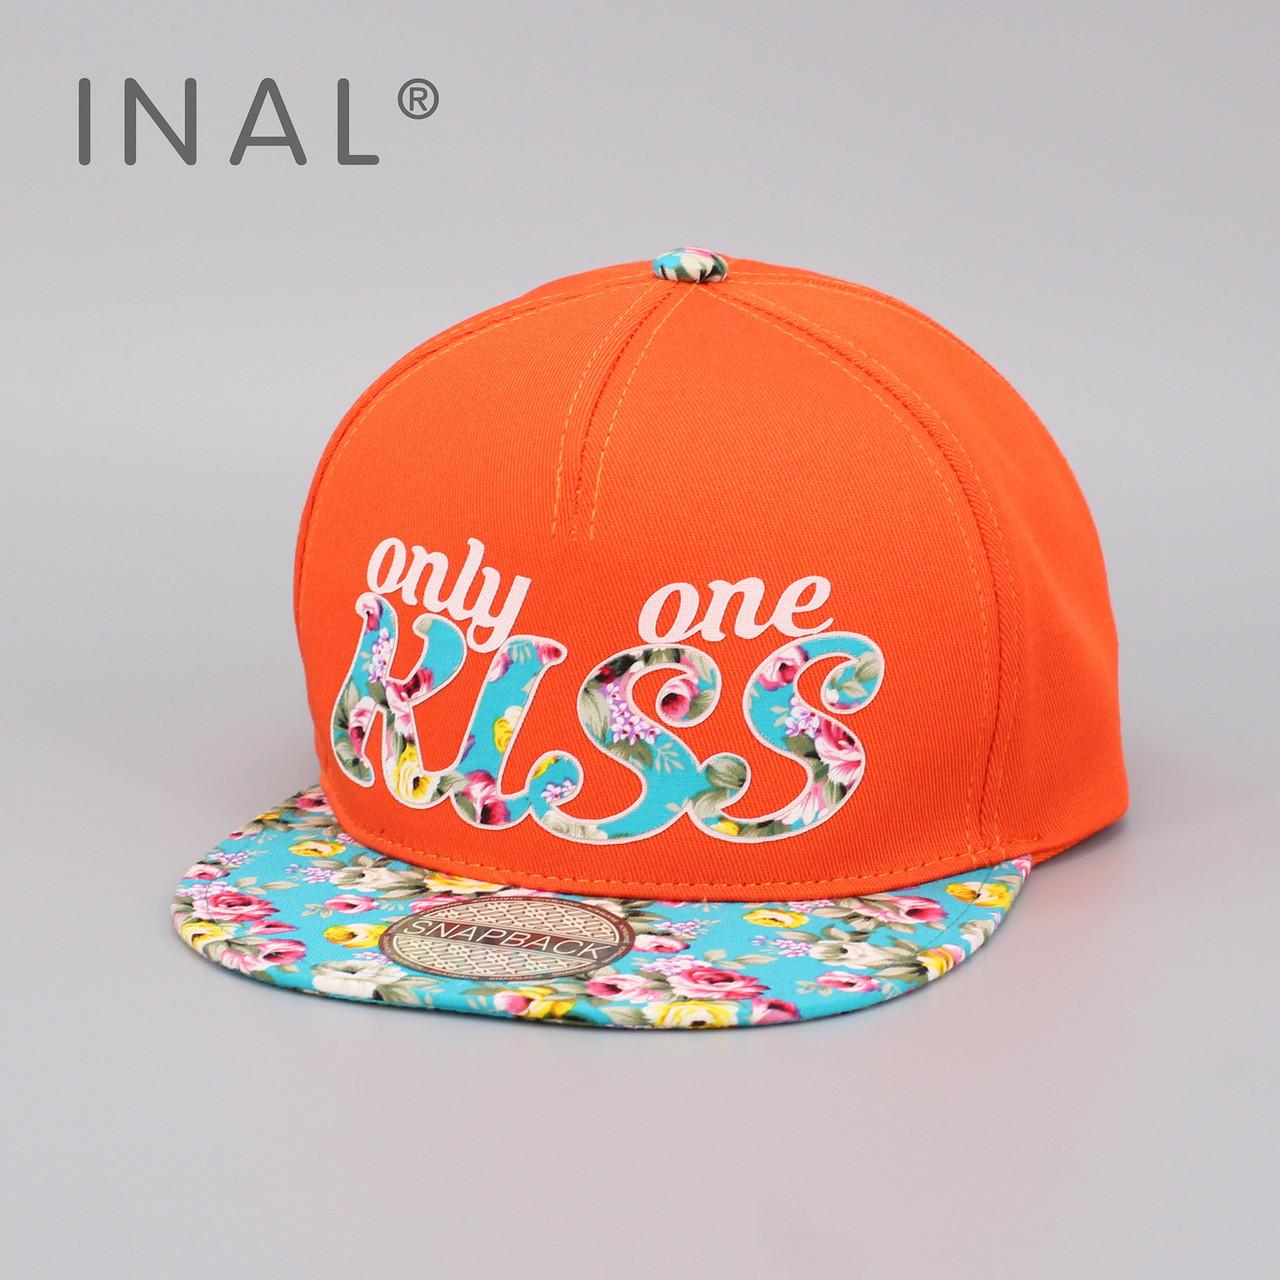 Кепка бейсболка INAL Kiss M / 55-56 RU Оранжевый 46255